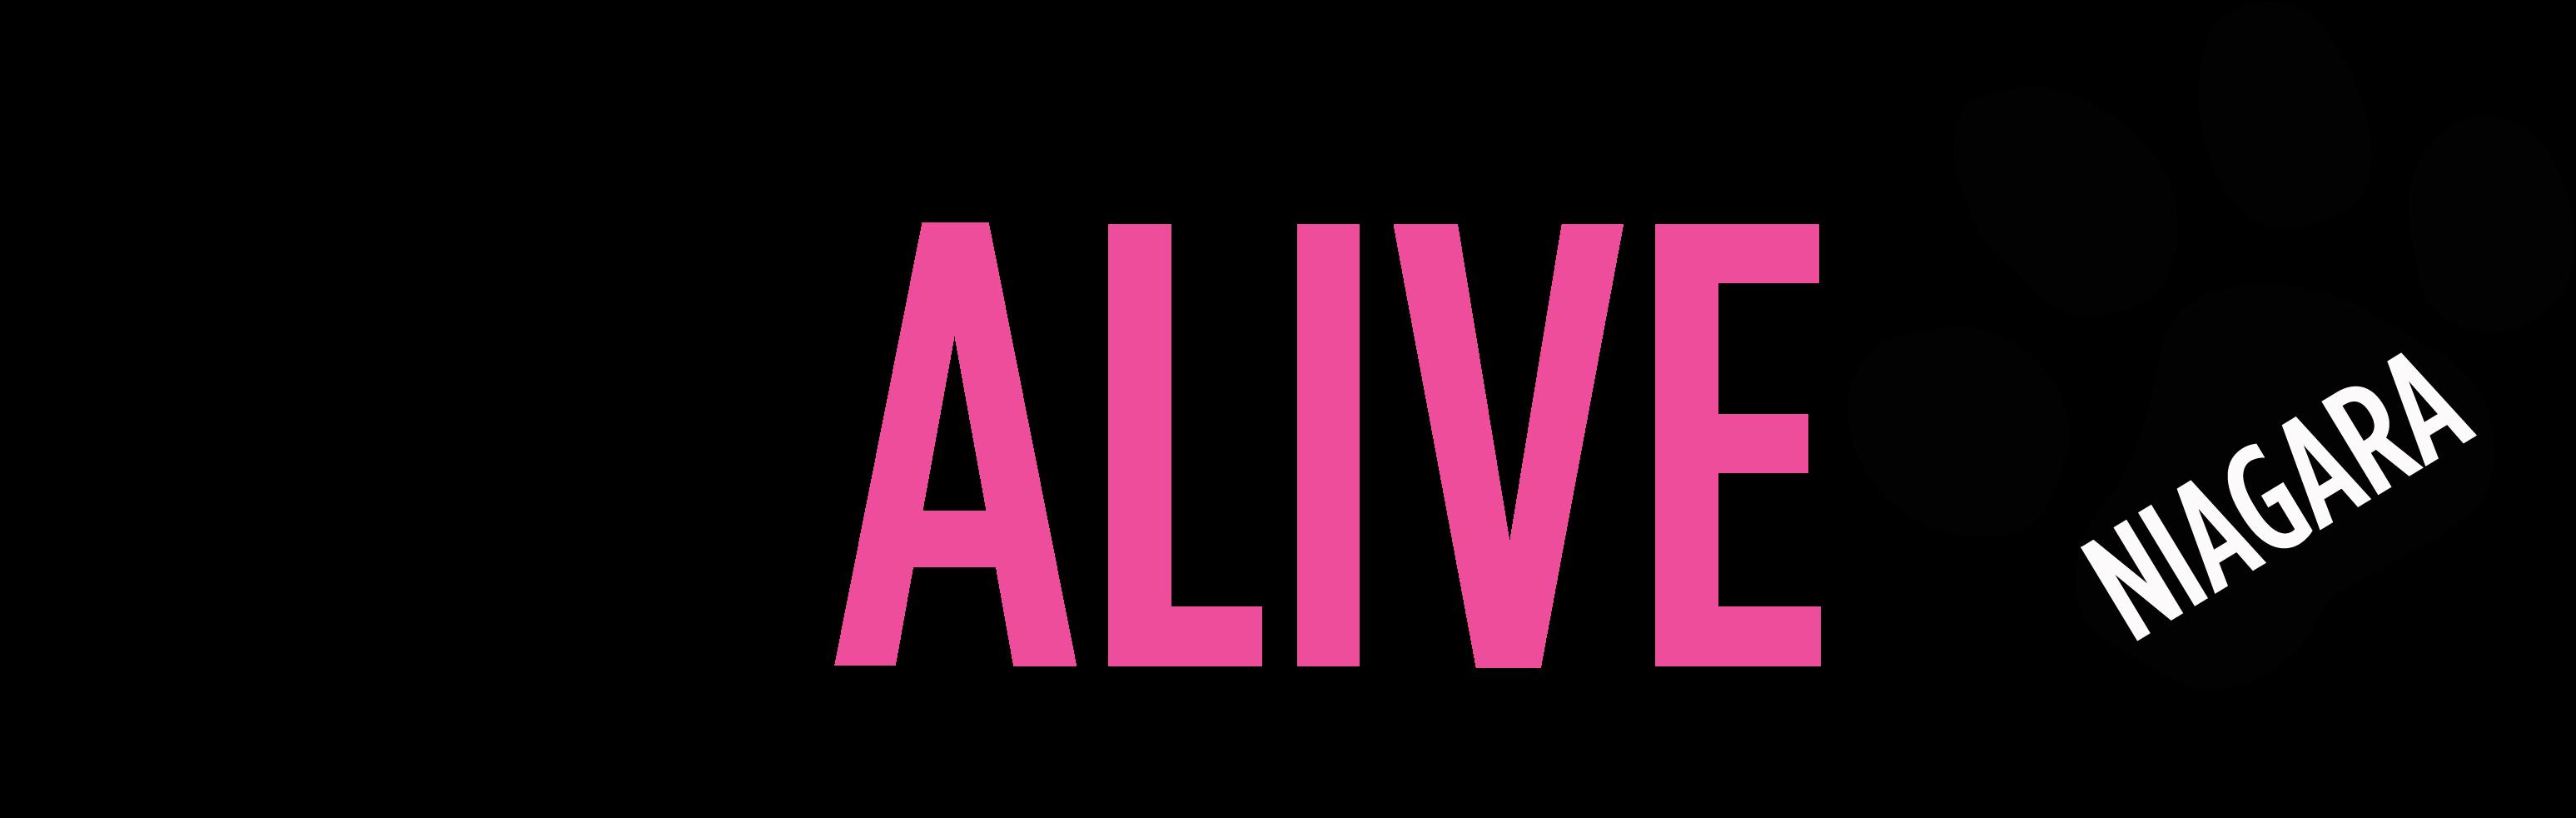 Pets Alive Niagara logo